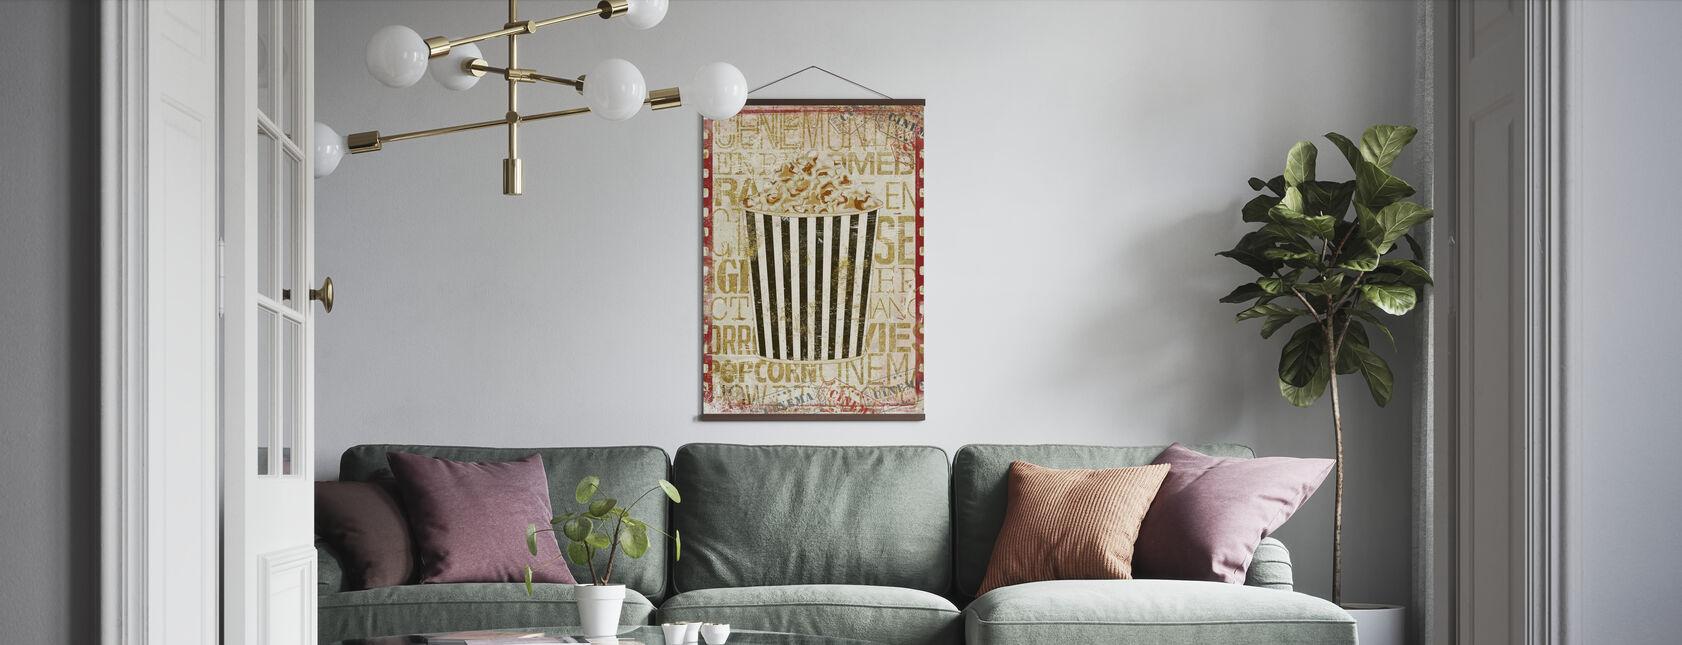 Cinema Popcorn - Poster - Living Room